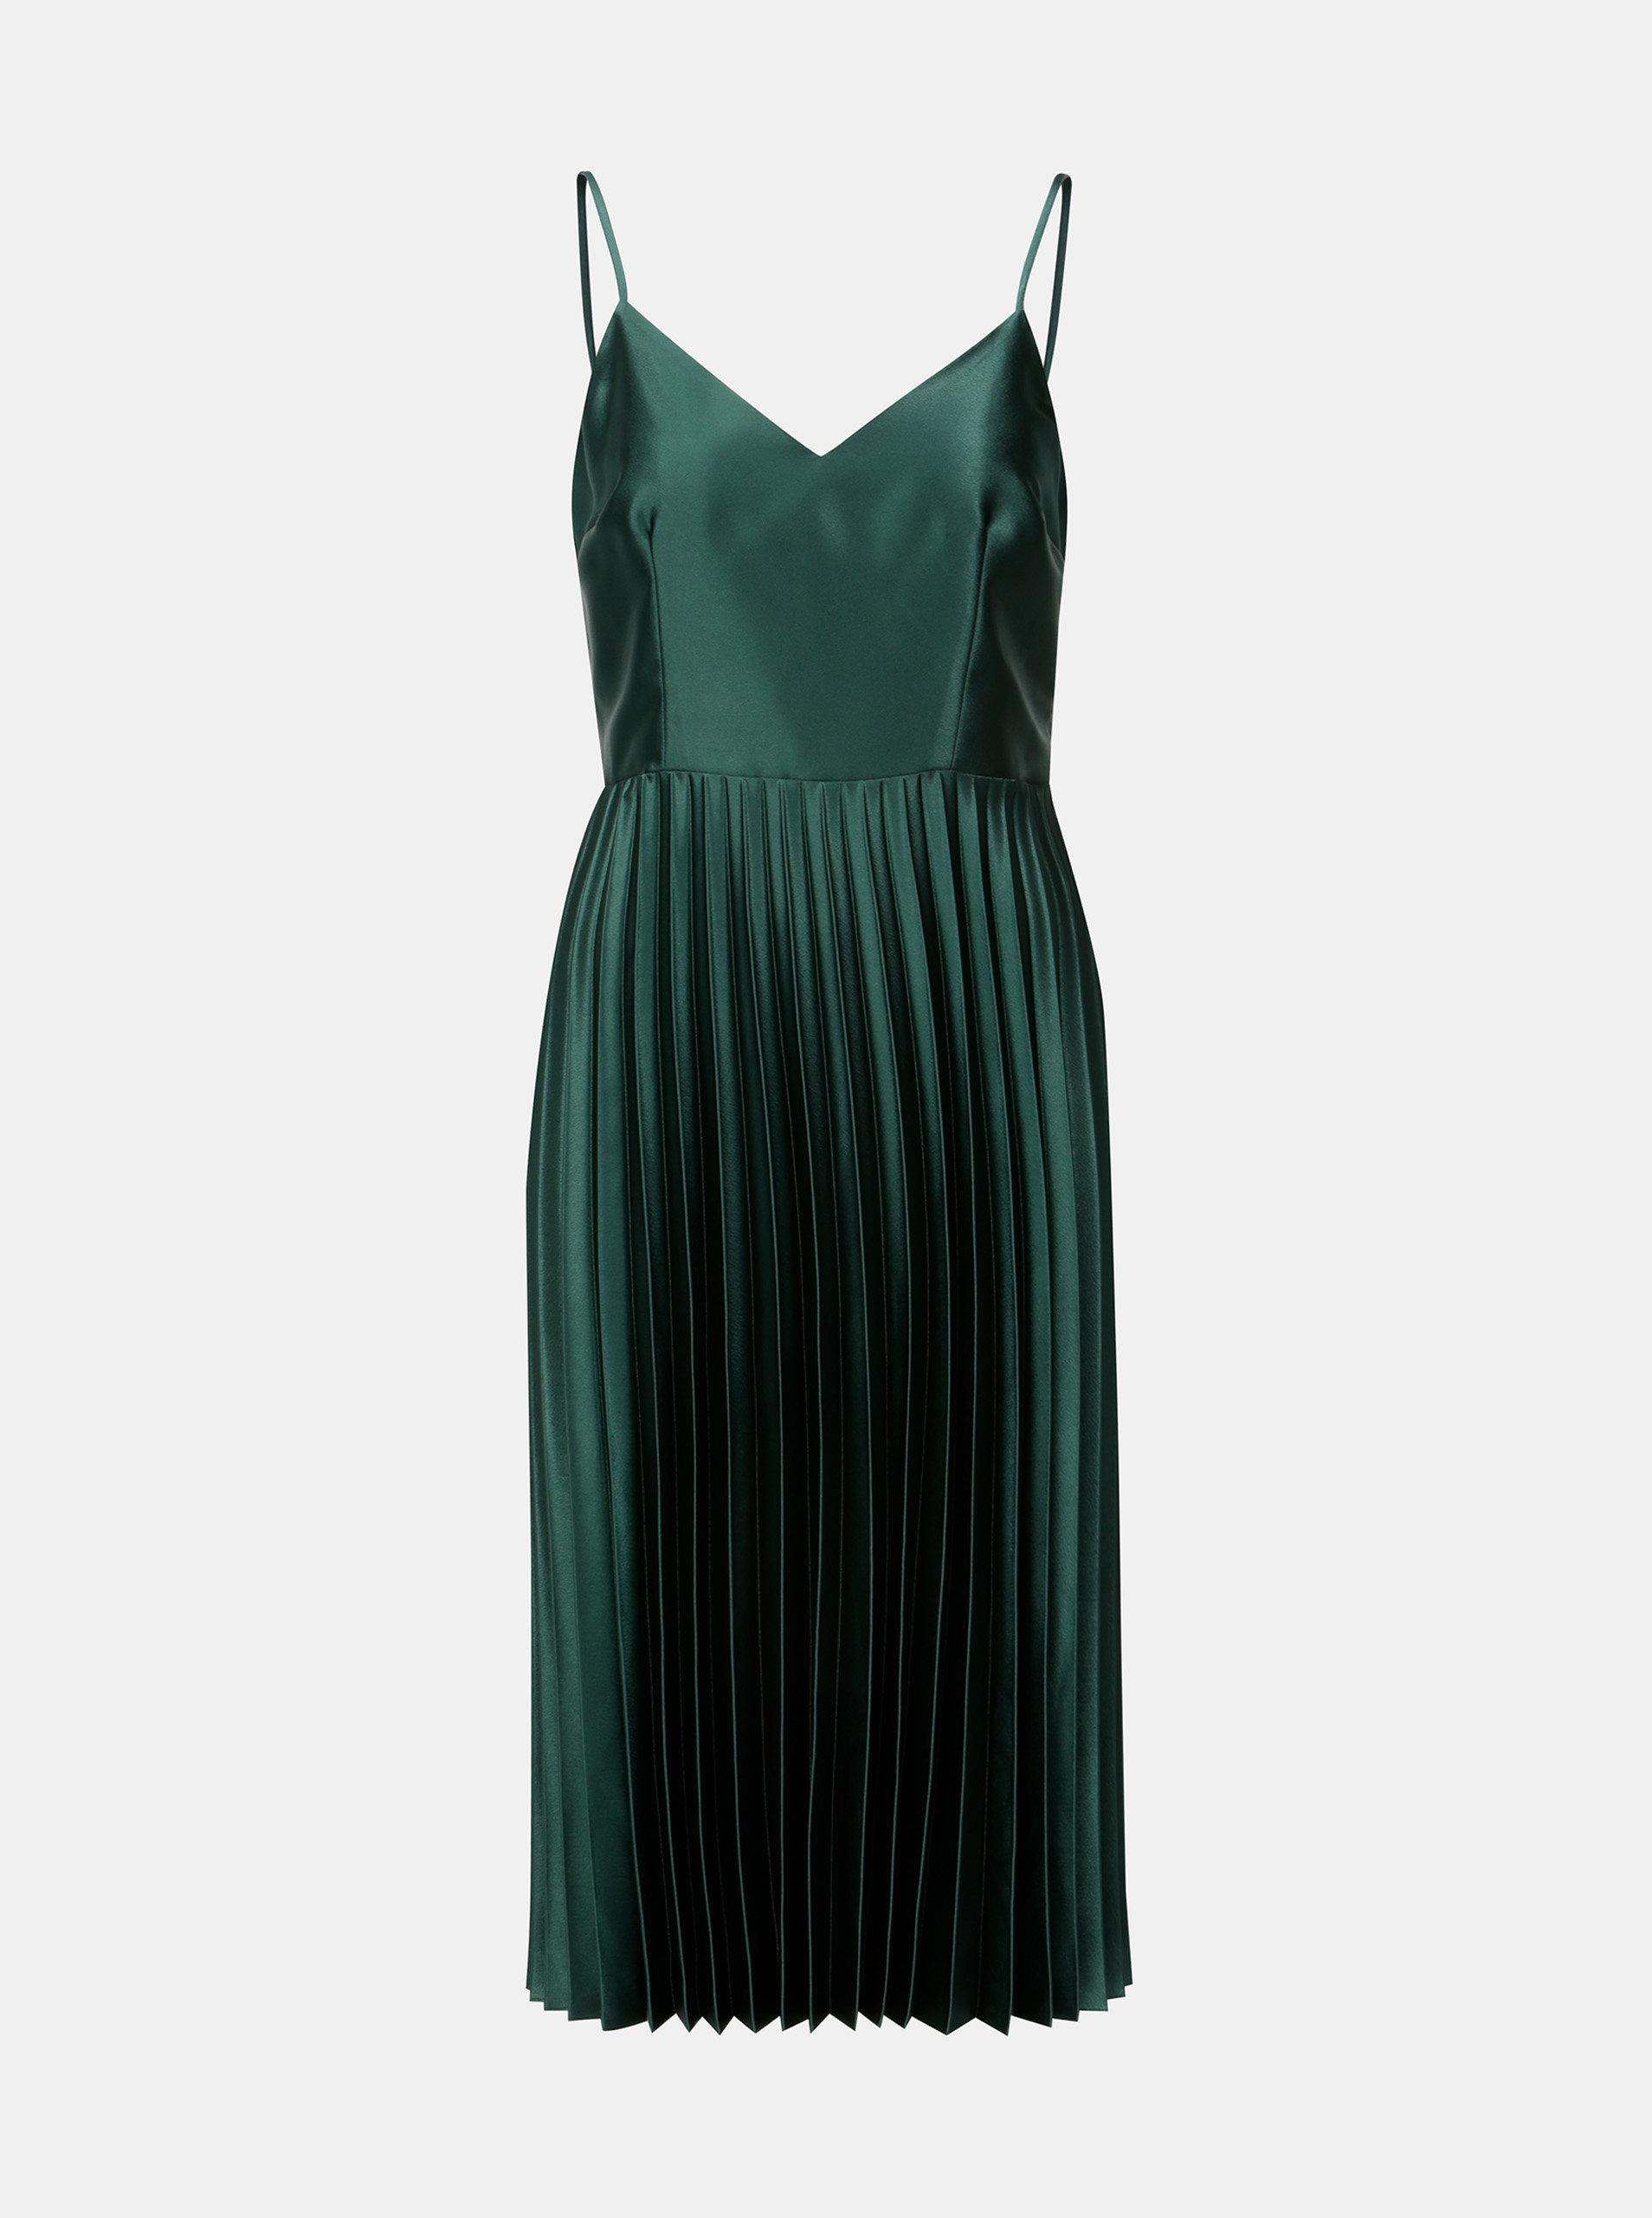 a9a2254b72c1 Zelené šaty s plisovanou sukňou Dorothy Perkins ...